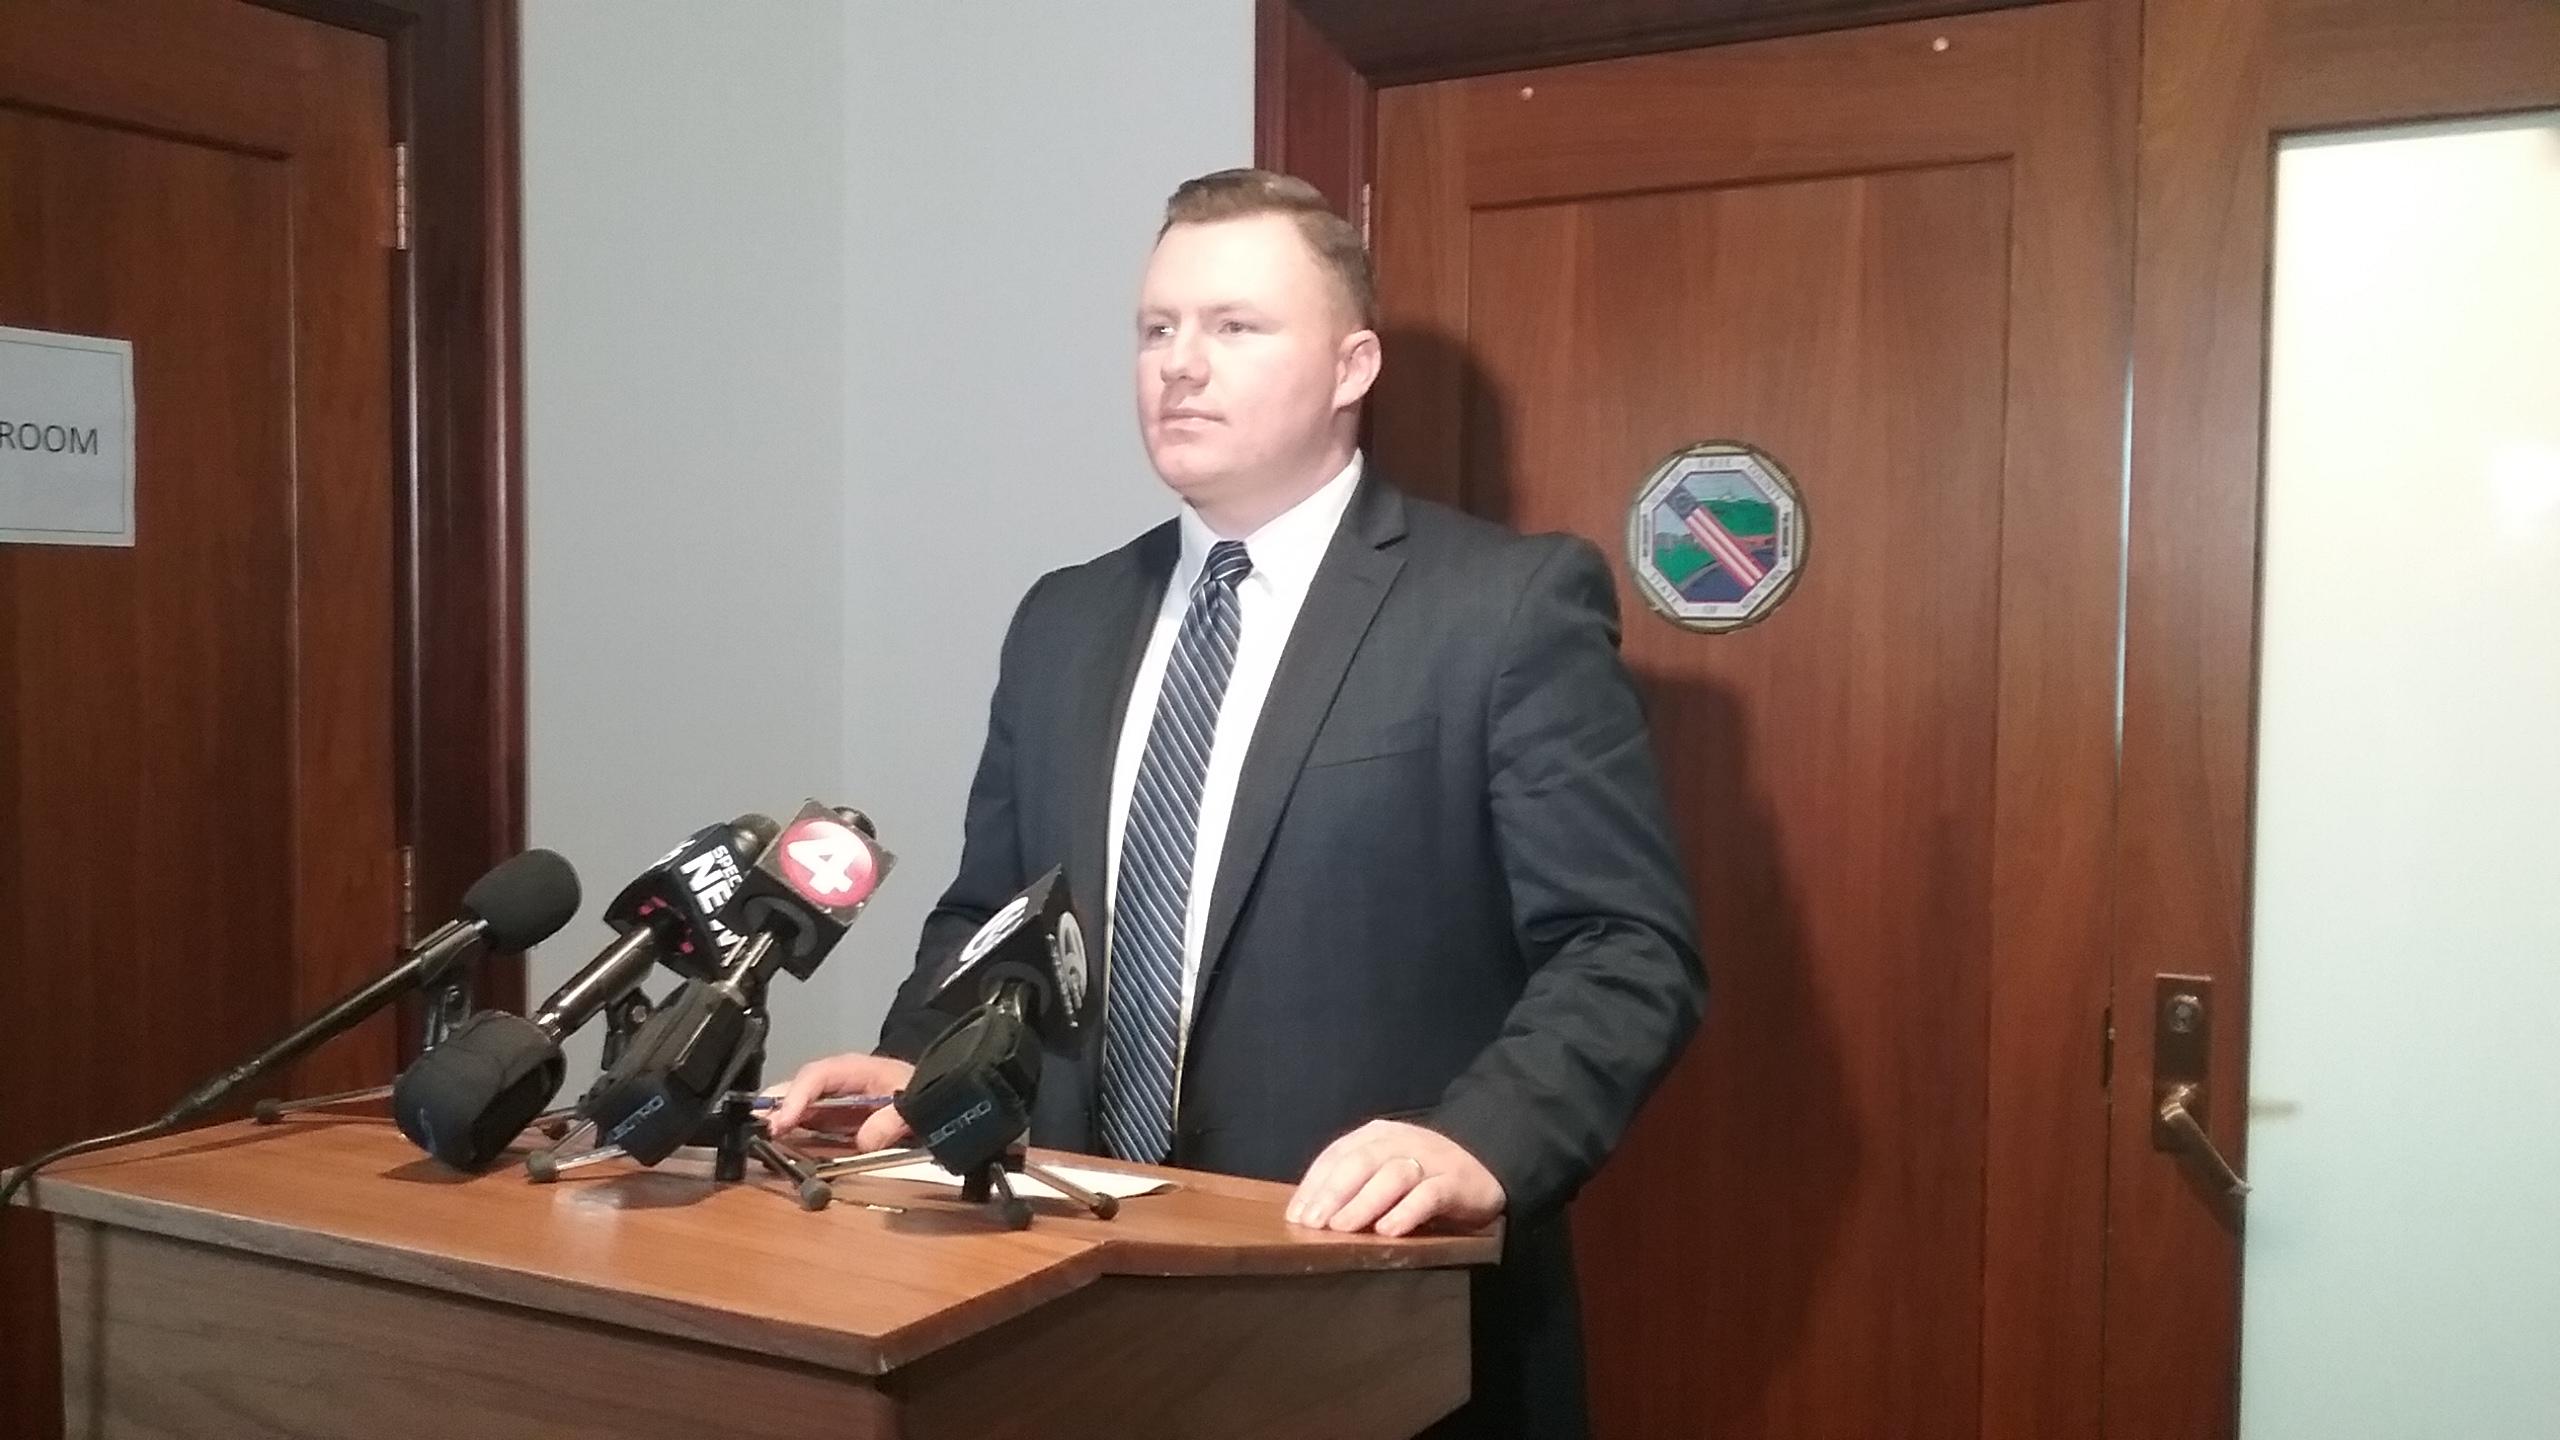 Legislator Patrick Burke, D-Buffalo, has sponsored a resolution to make conversion therapy illegal.